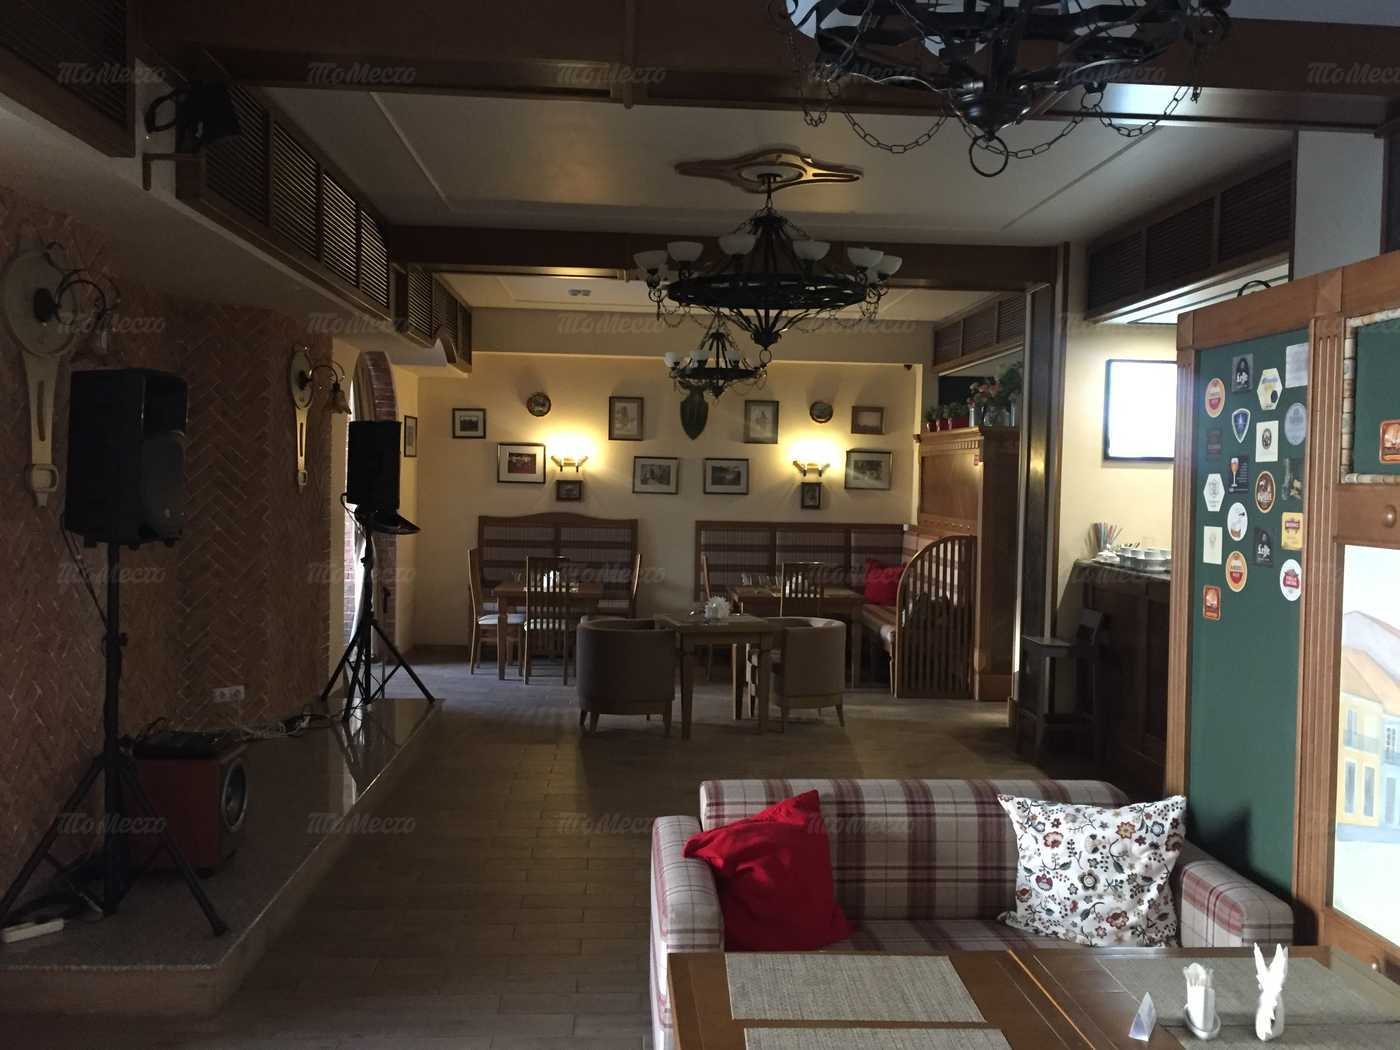 Ресторан Bretzel (Брецель) на улице Химиков фото 8